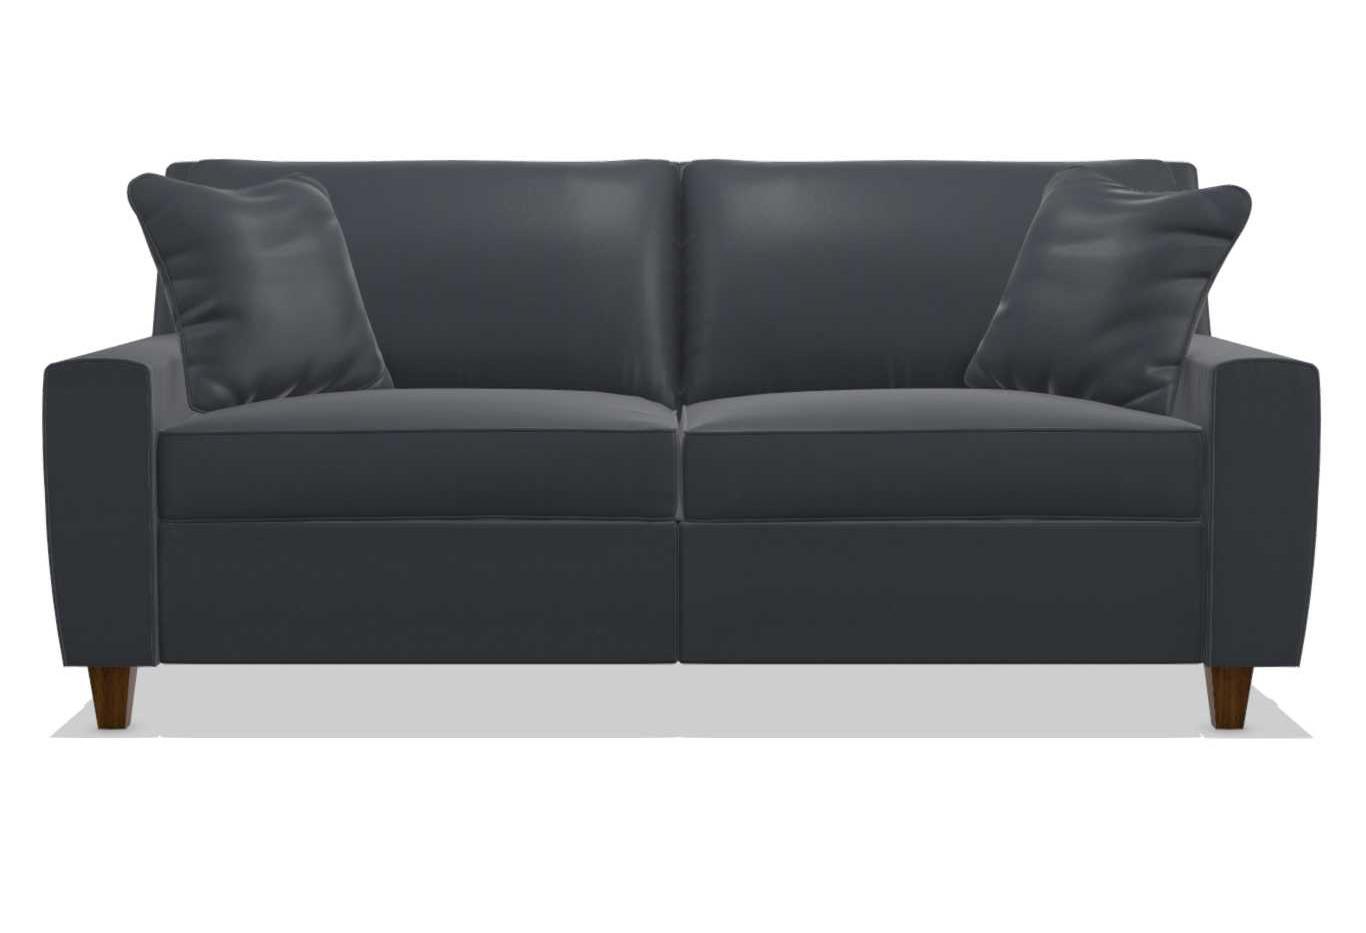 Edie duo® Reclining 2-Seat Sofa